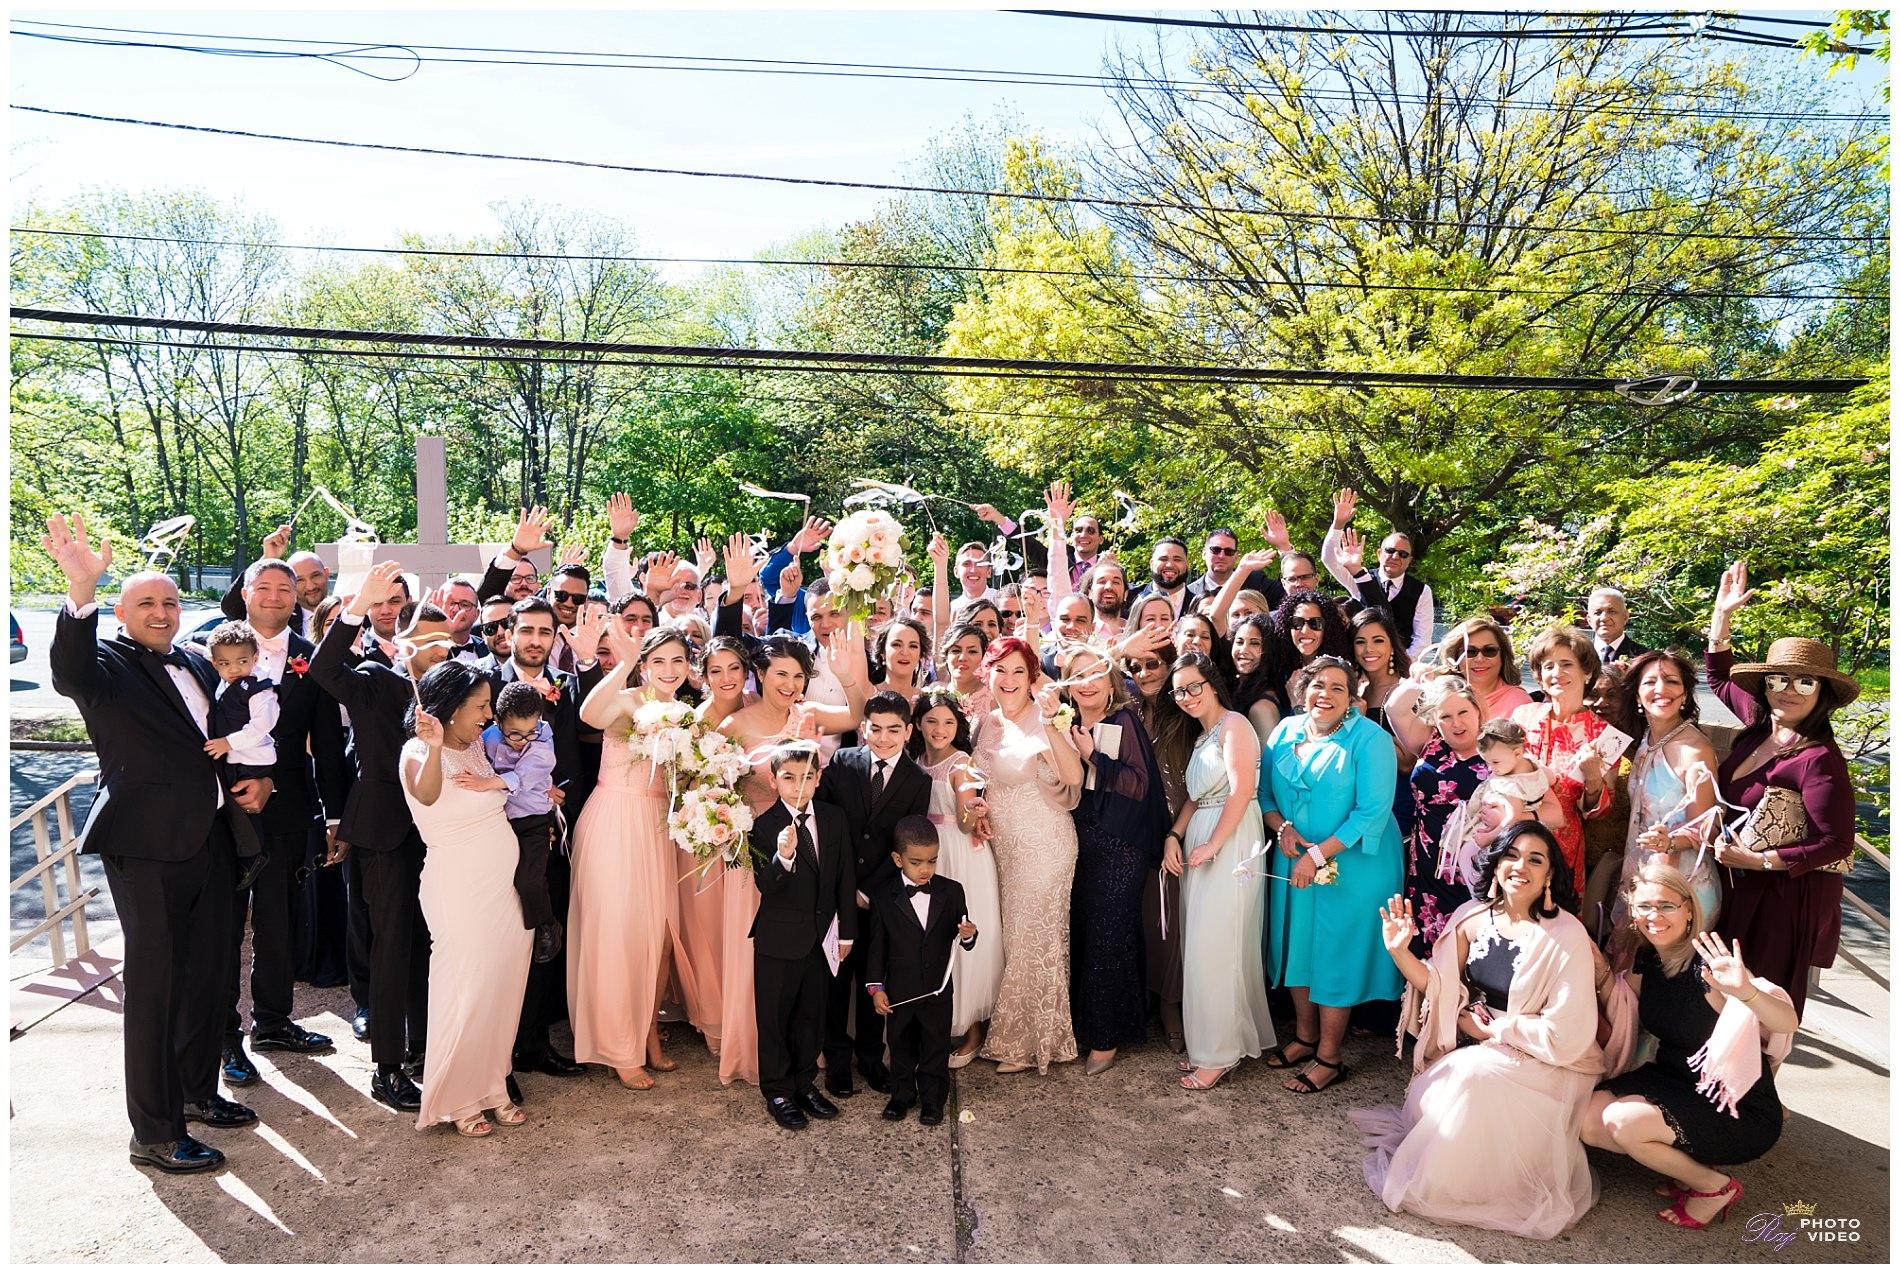 St-Valentines-Catholic-Church-Bloomfield-NJ-Wedding-Yanet-Jose-19.jpg